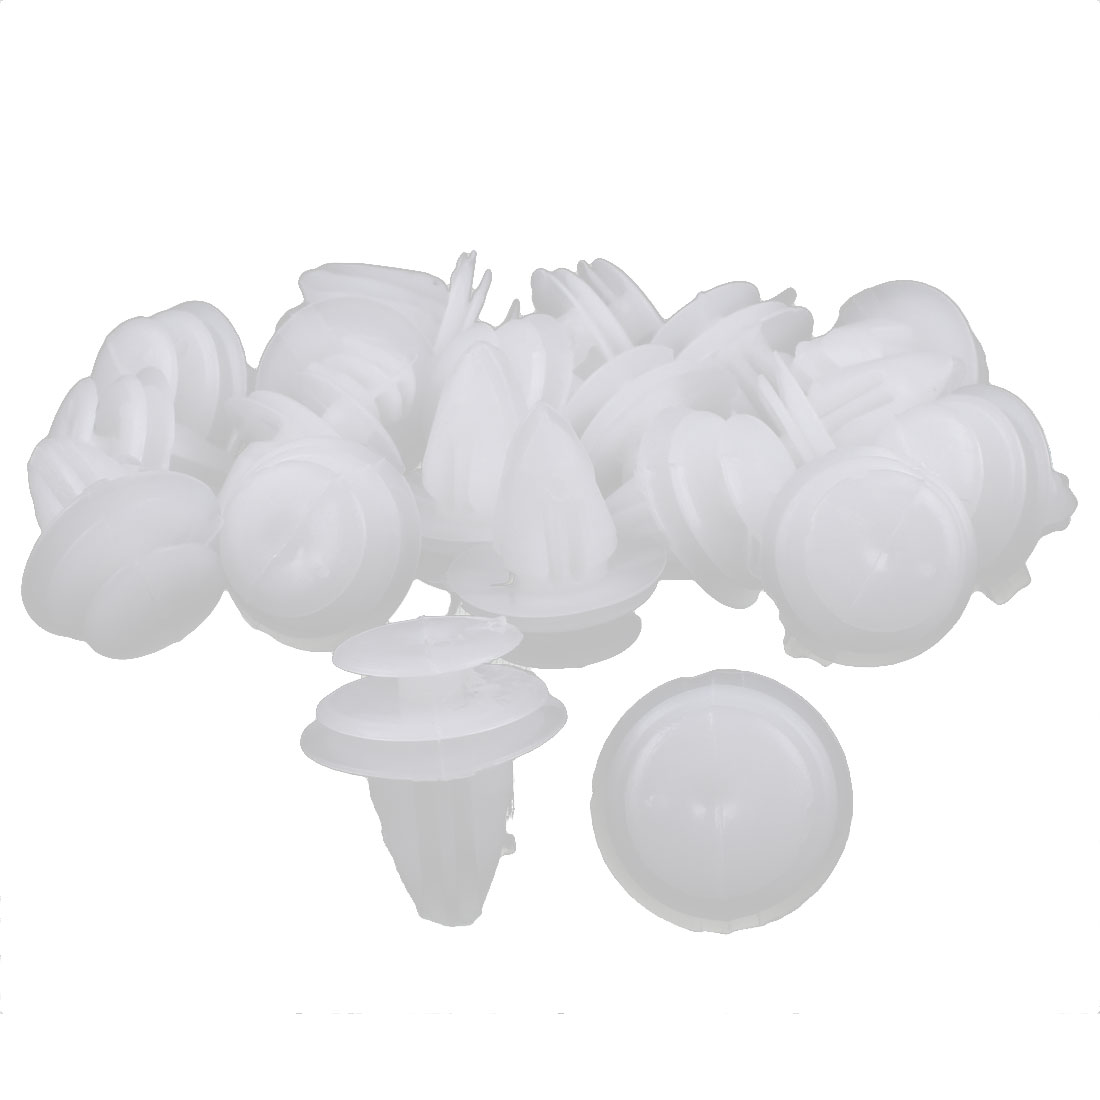 20 Pcs White Plastic Rivets Trim Fastener Moulding Clips 14mm x 18mm x 22mm